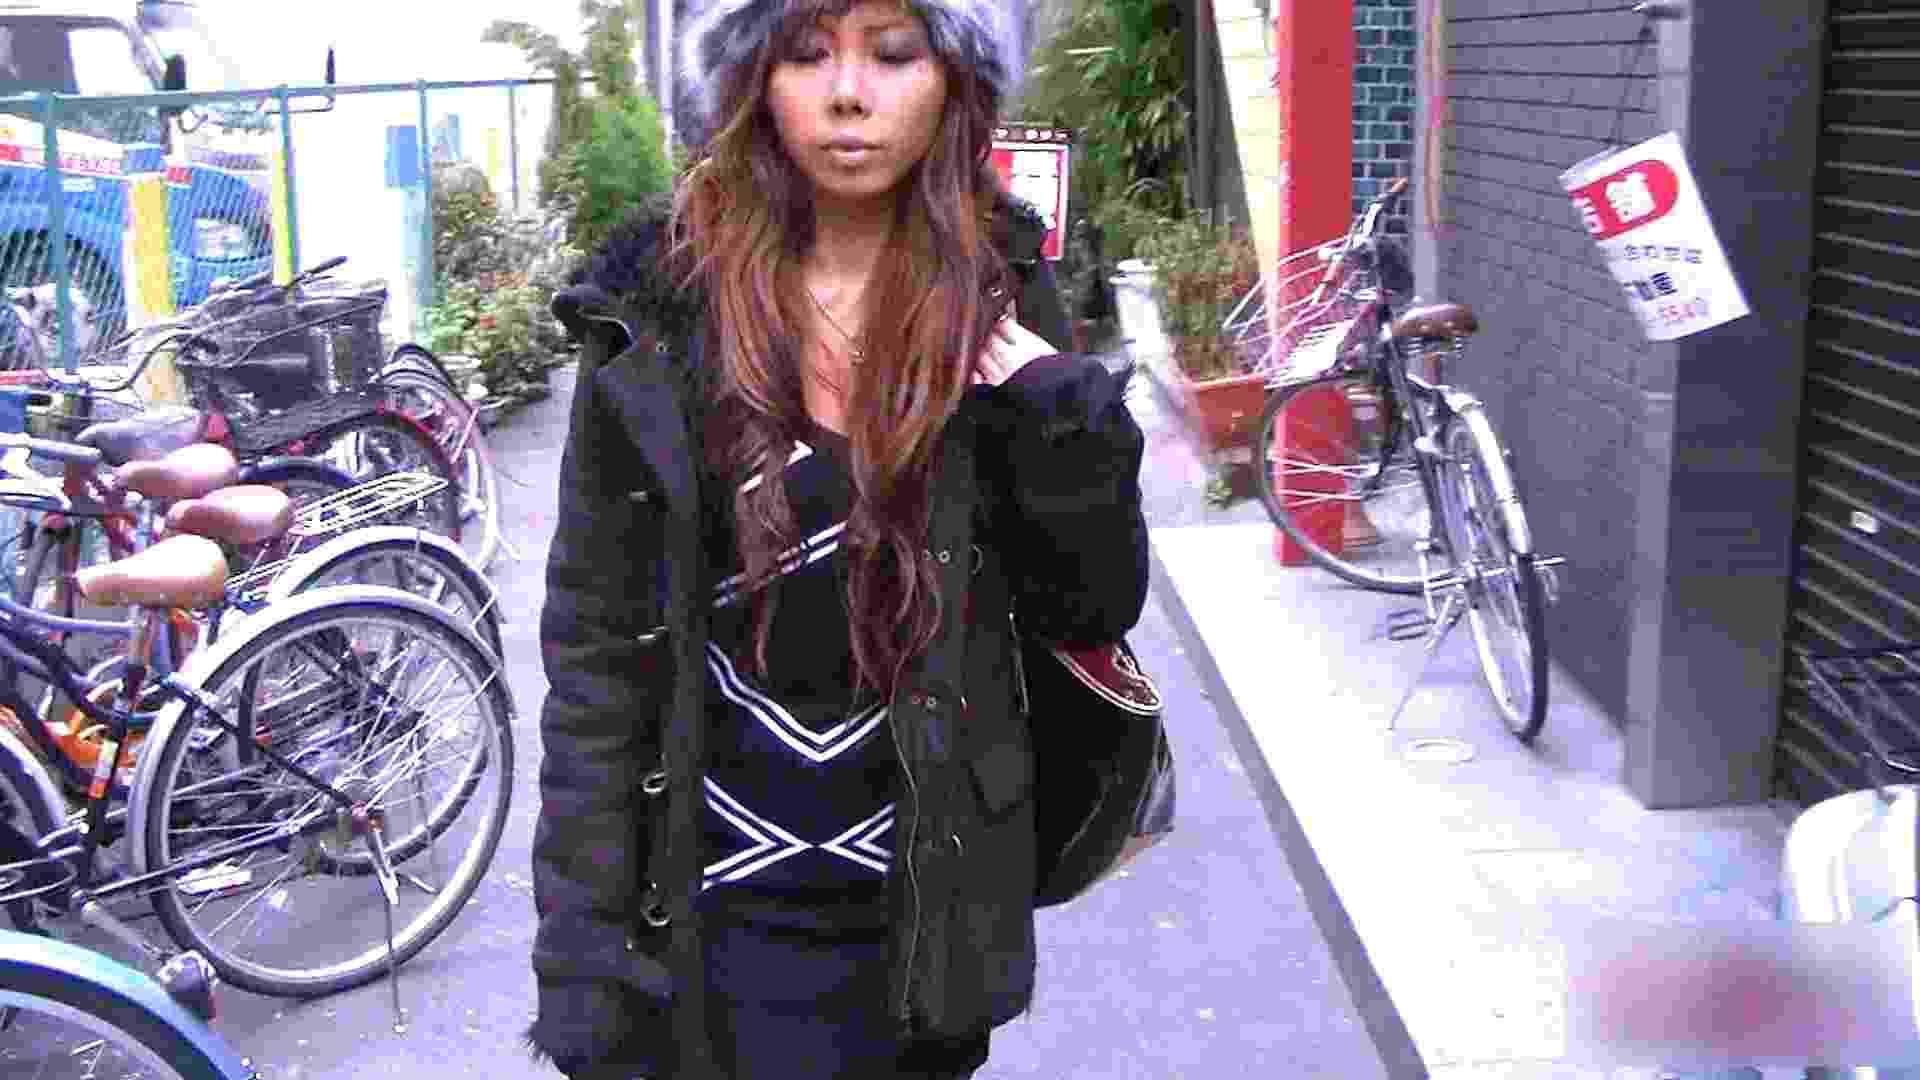 S級厳選美女ビッチガールVol.18 美女ヌード | OLセックス  78画像 1